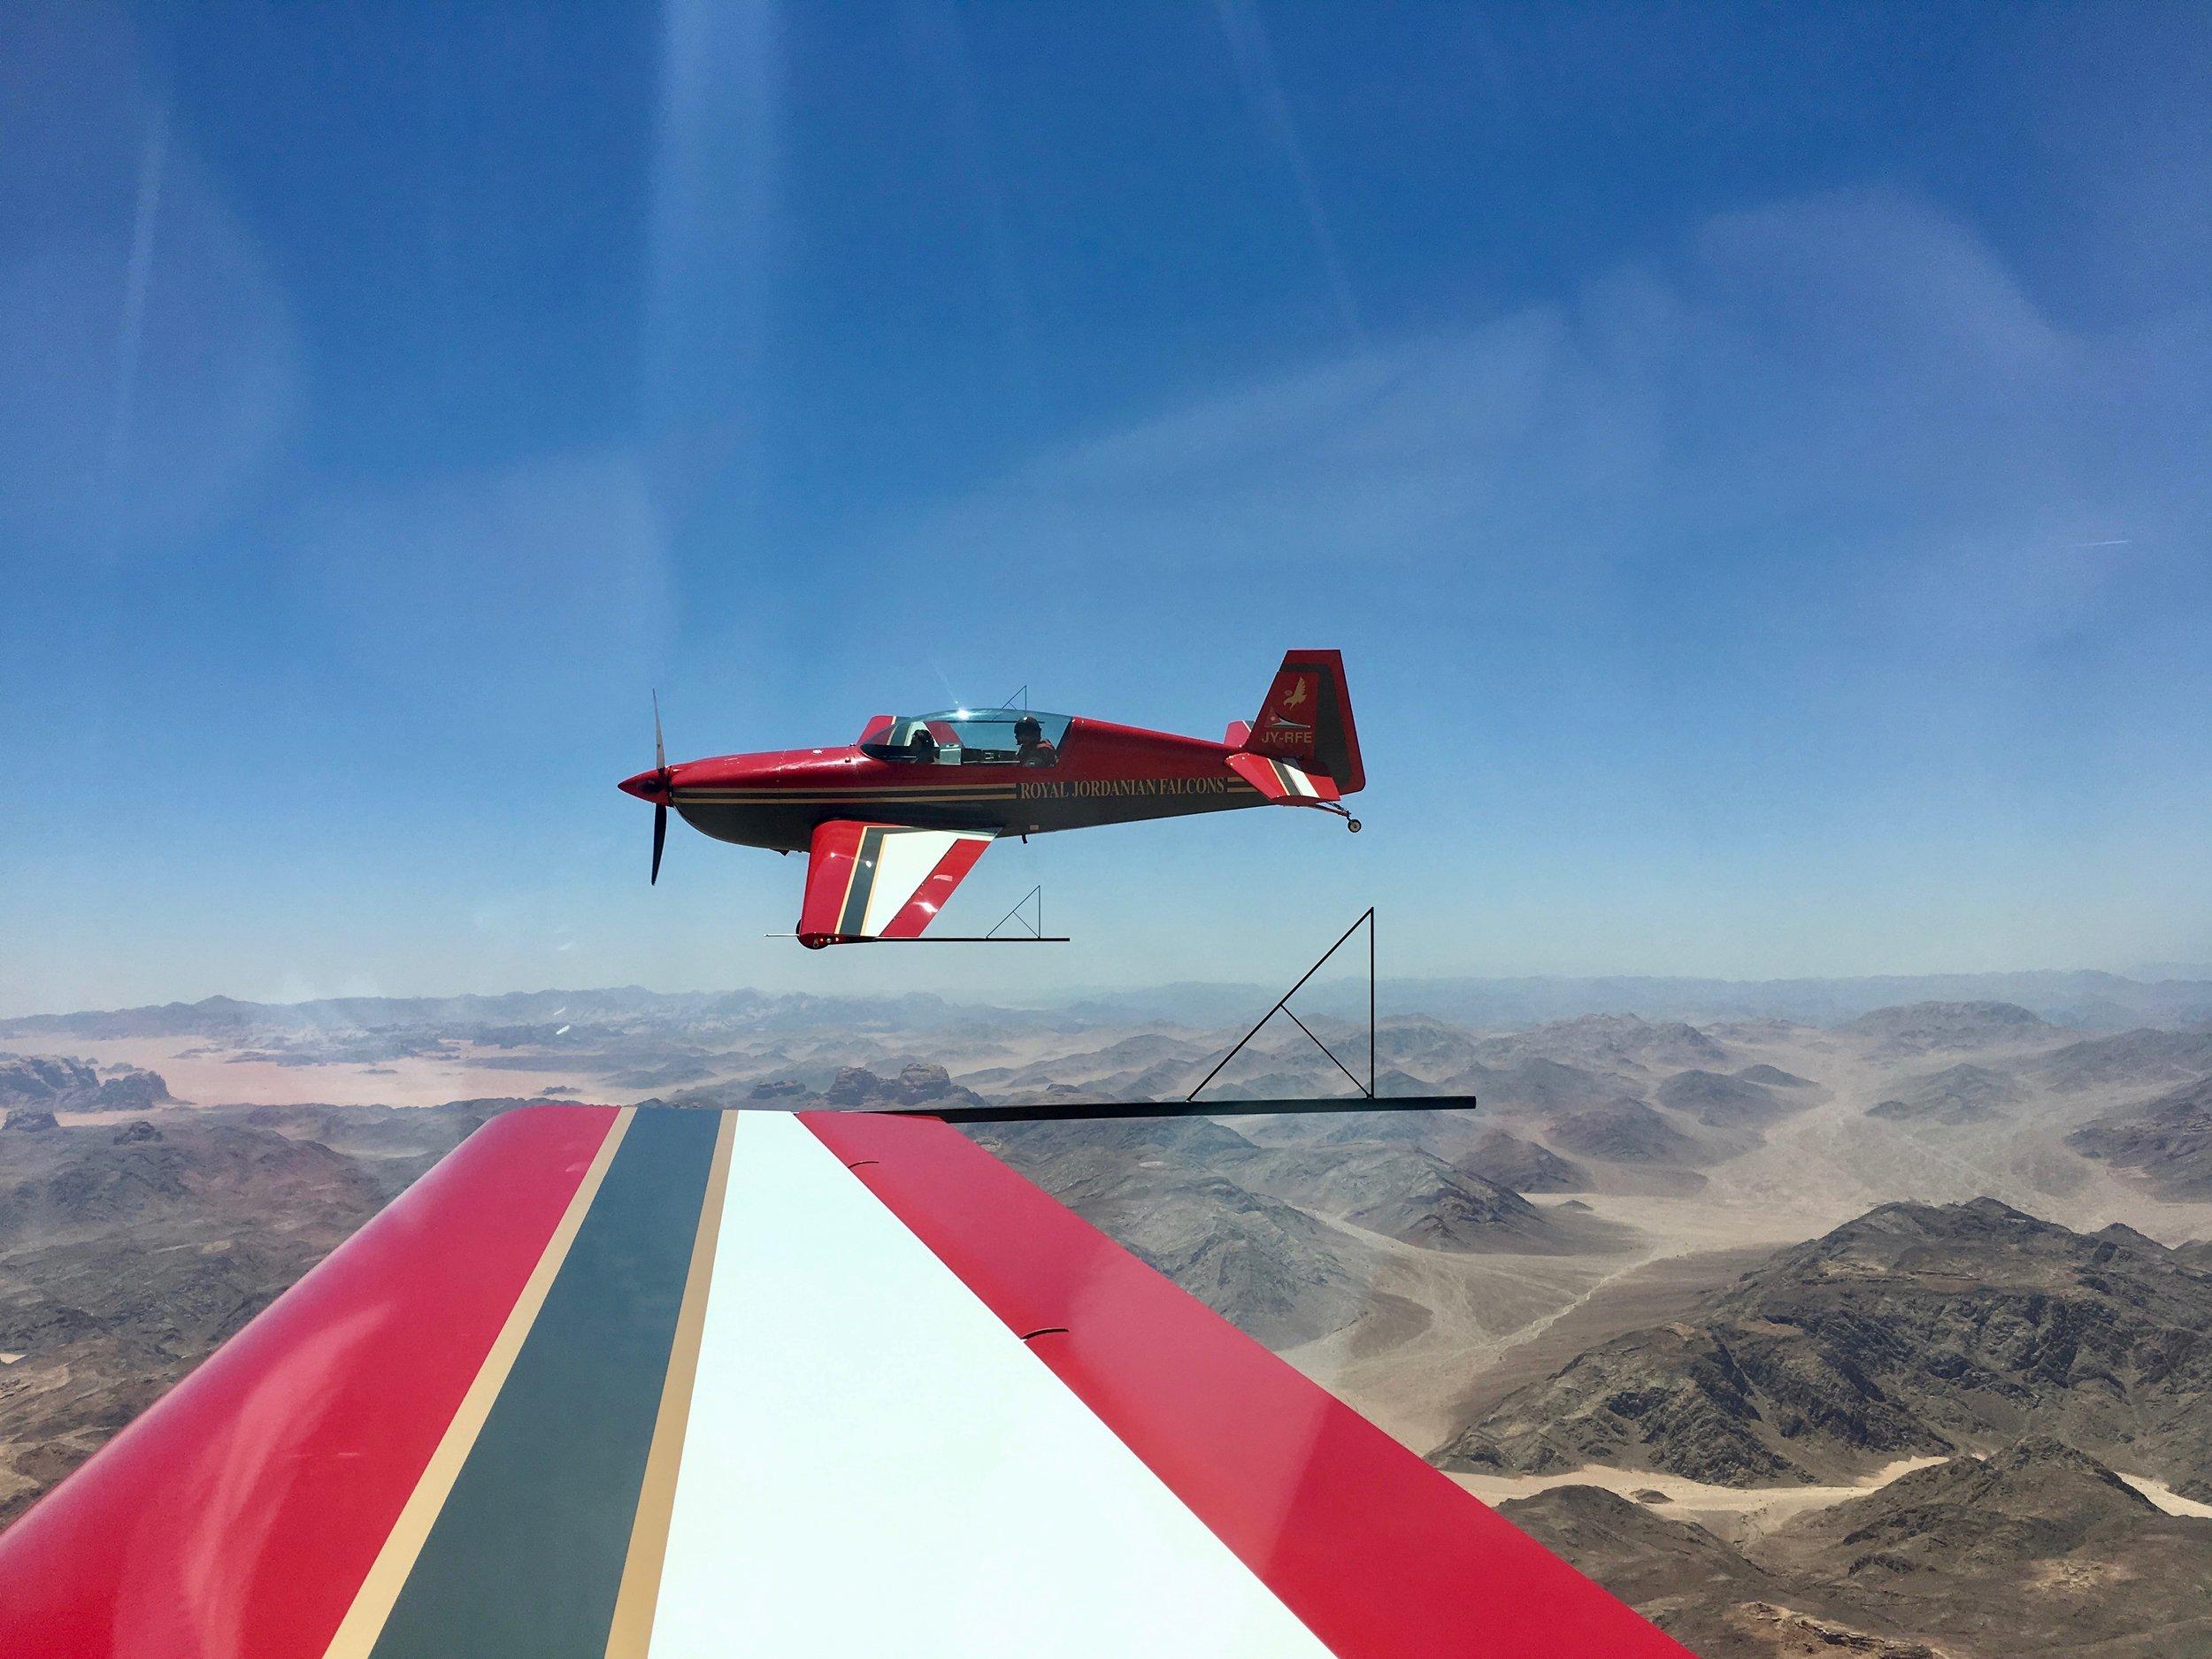 Xtra 300L over Wadi Rum Desert